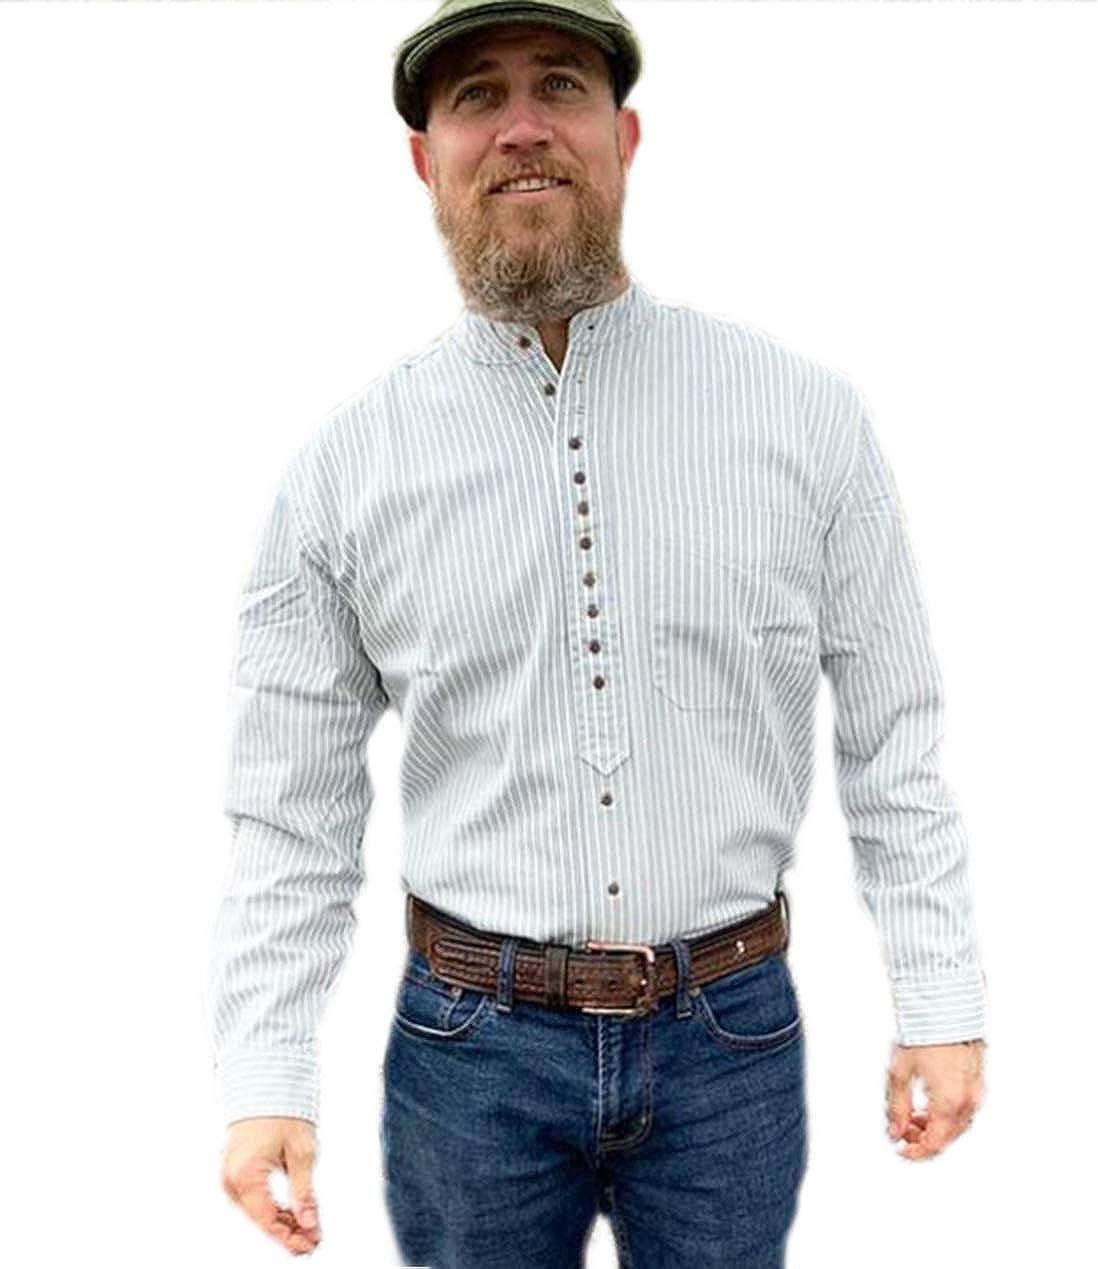 Traditional 在庫処分 Irish Grandfather Shirt - Pinstripe 大特価!! Gray and White